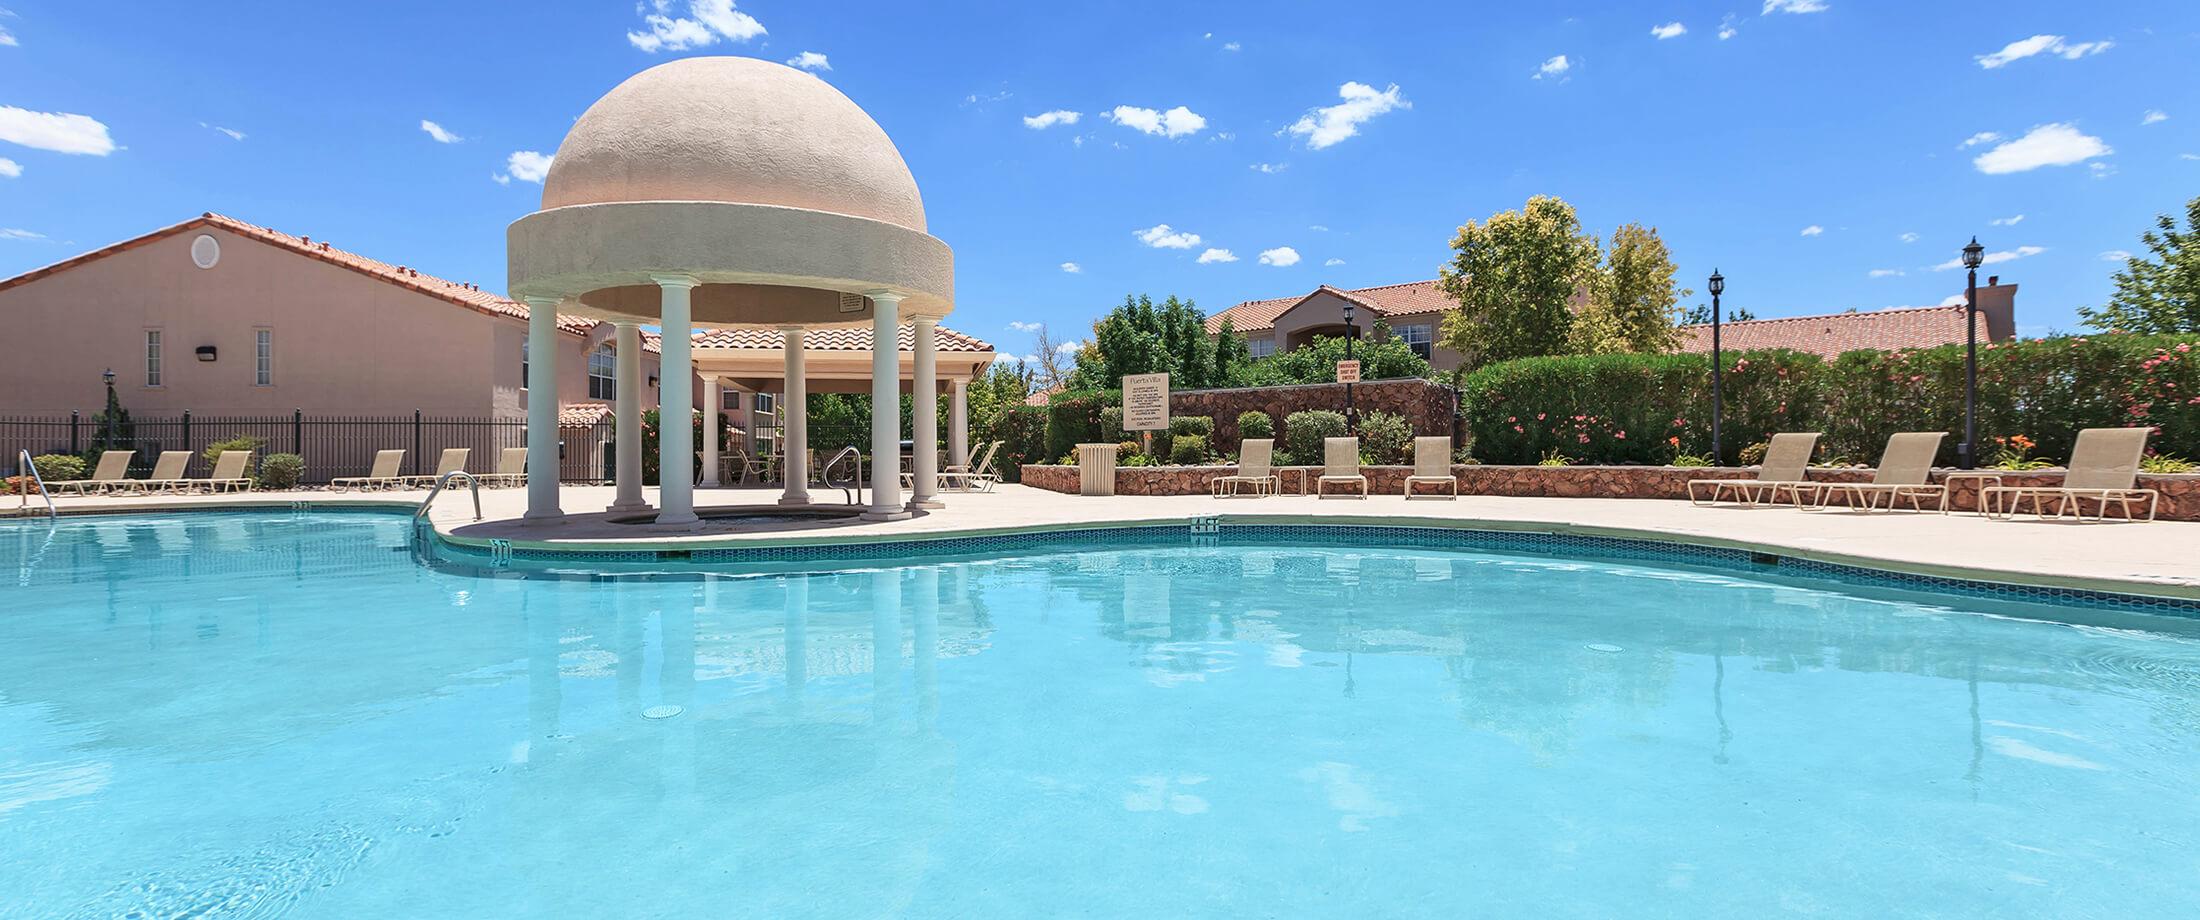 Puerta Villa At Pellicano Apartments In El Paso Tx